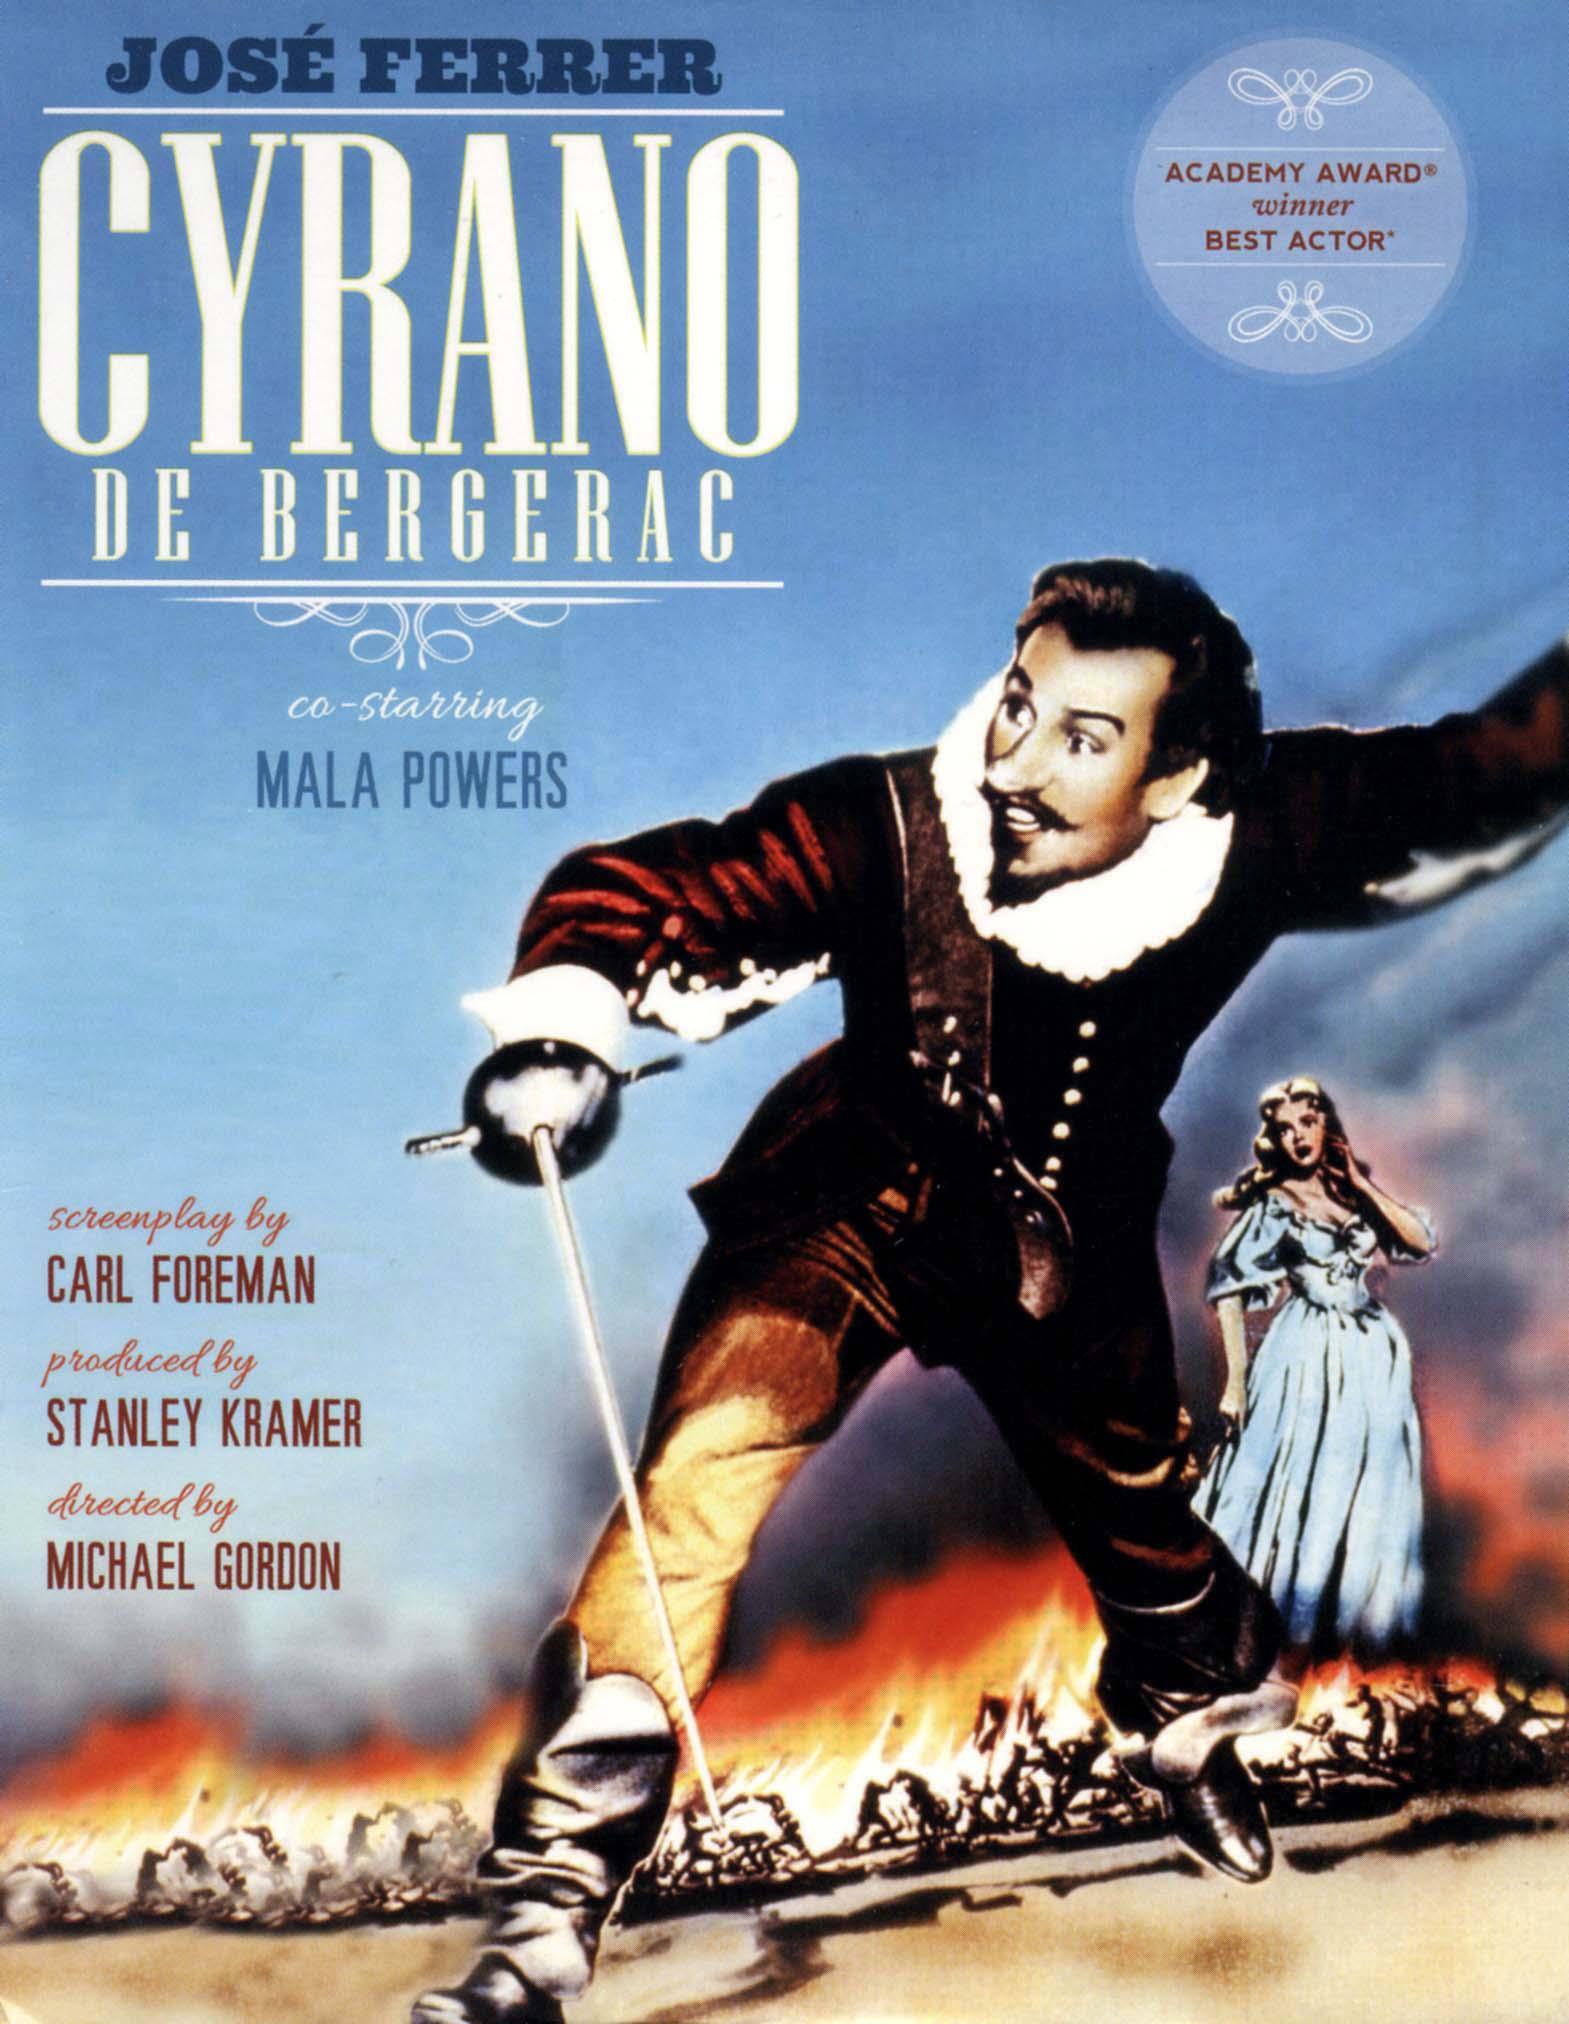 Cyrano De Bergerac [blu-ray] 20385348